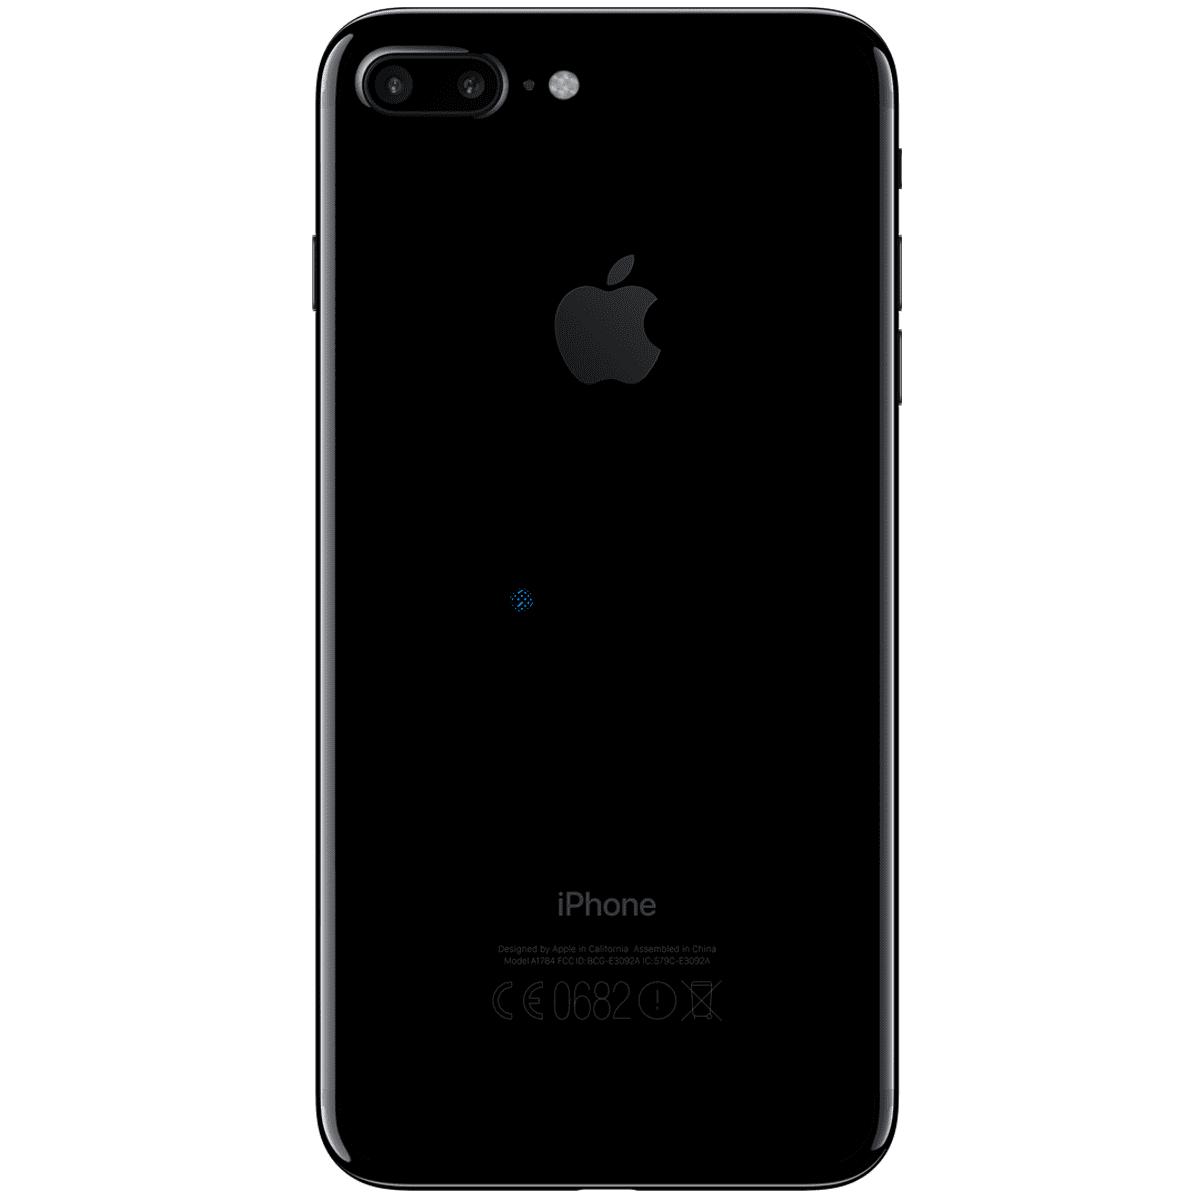 Apple APPLE IPHONE 7 A1778 32GB BLACK - GRADE B (A1778-32GB-IPHONE7-BLACK-B)